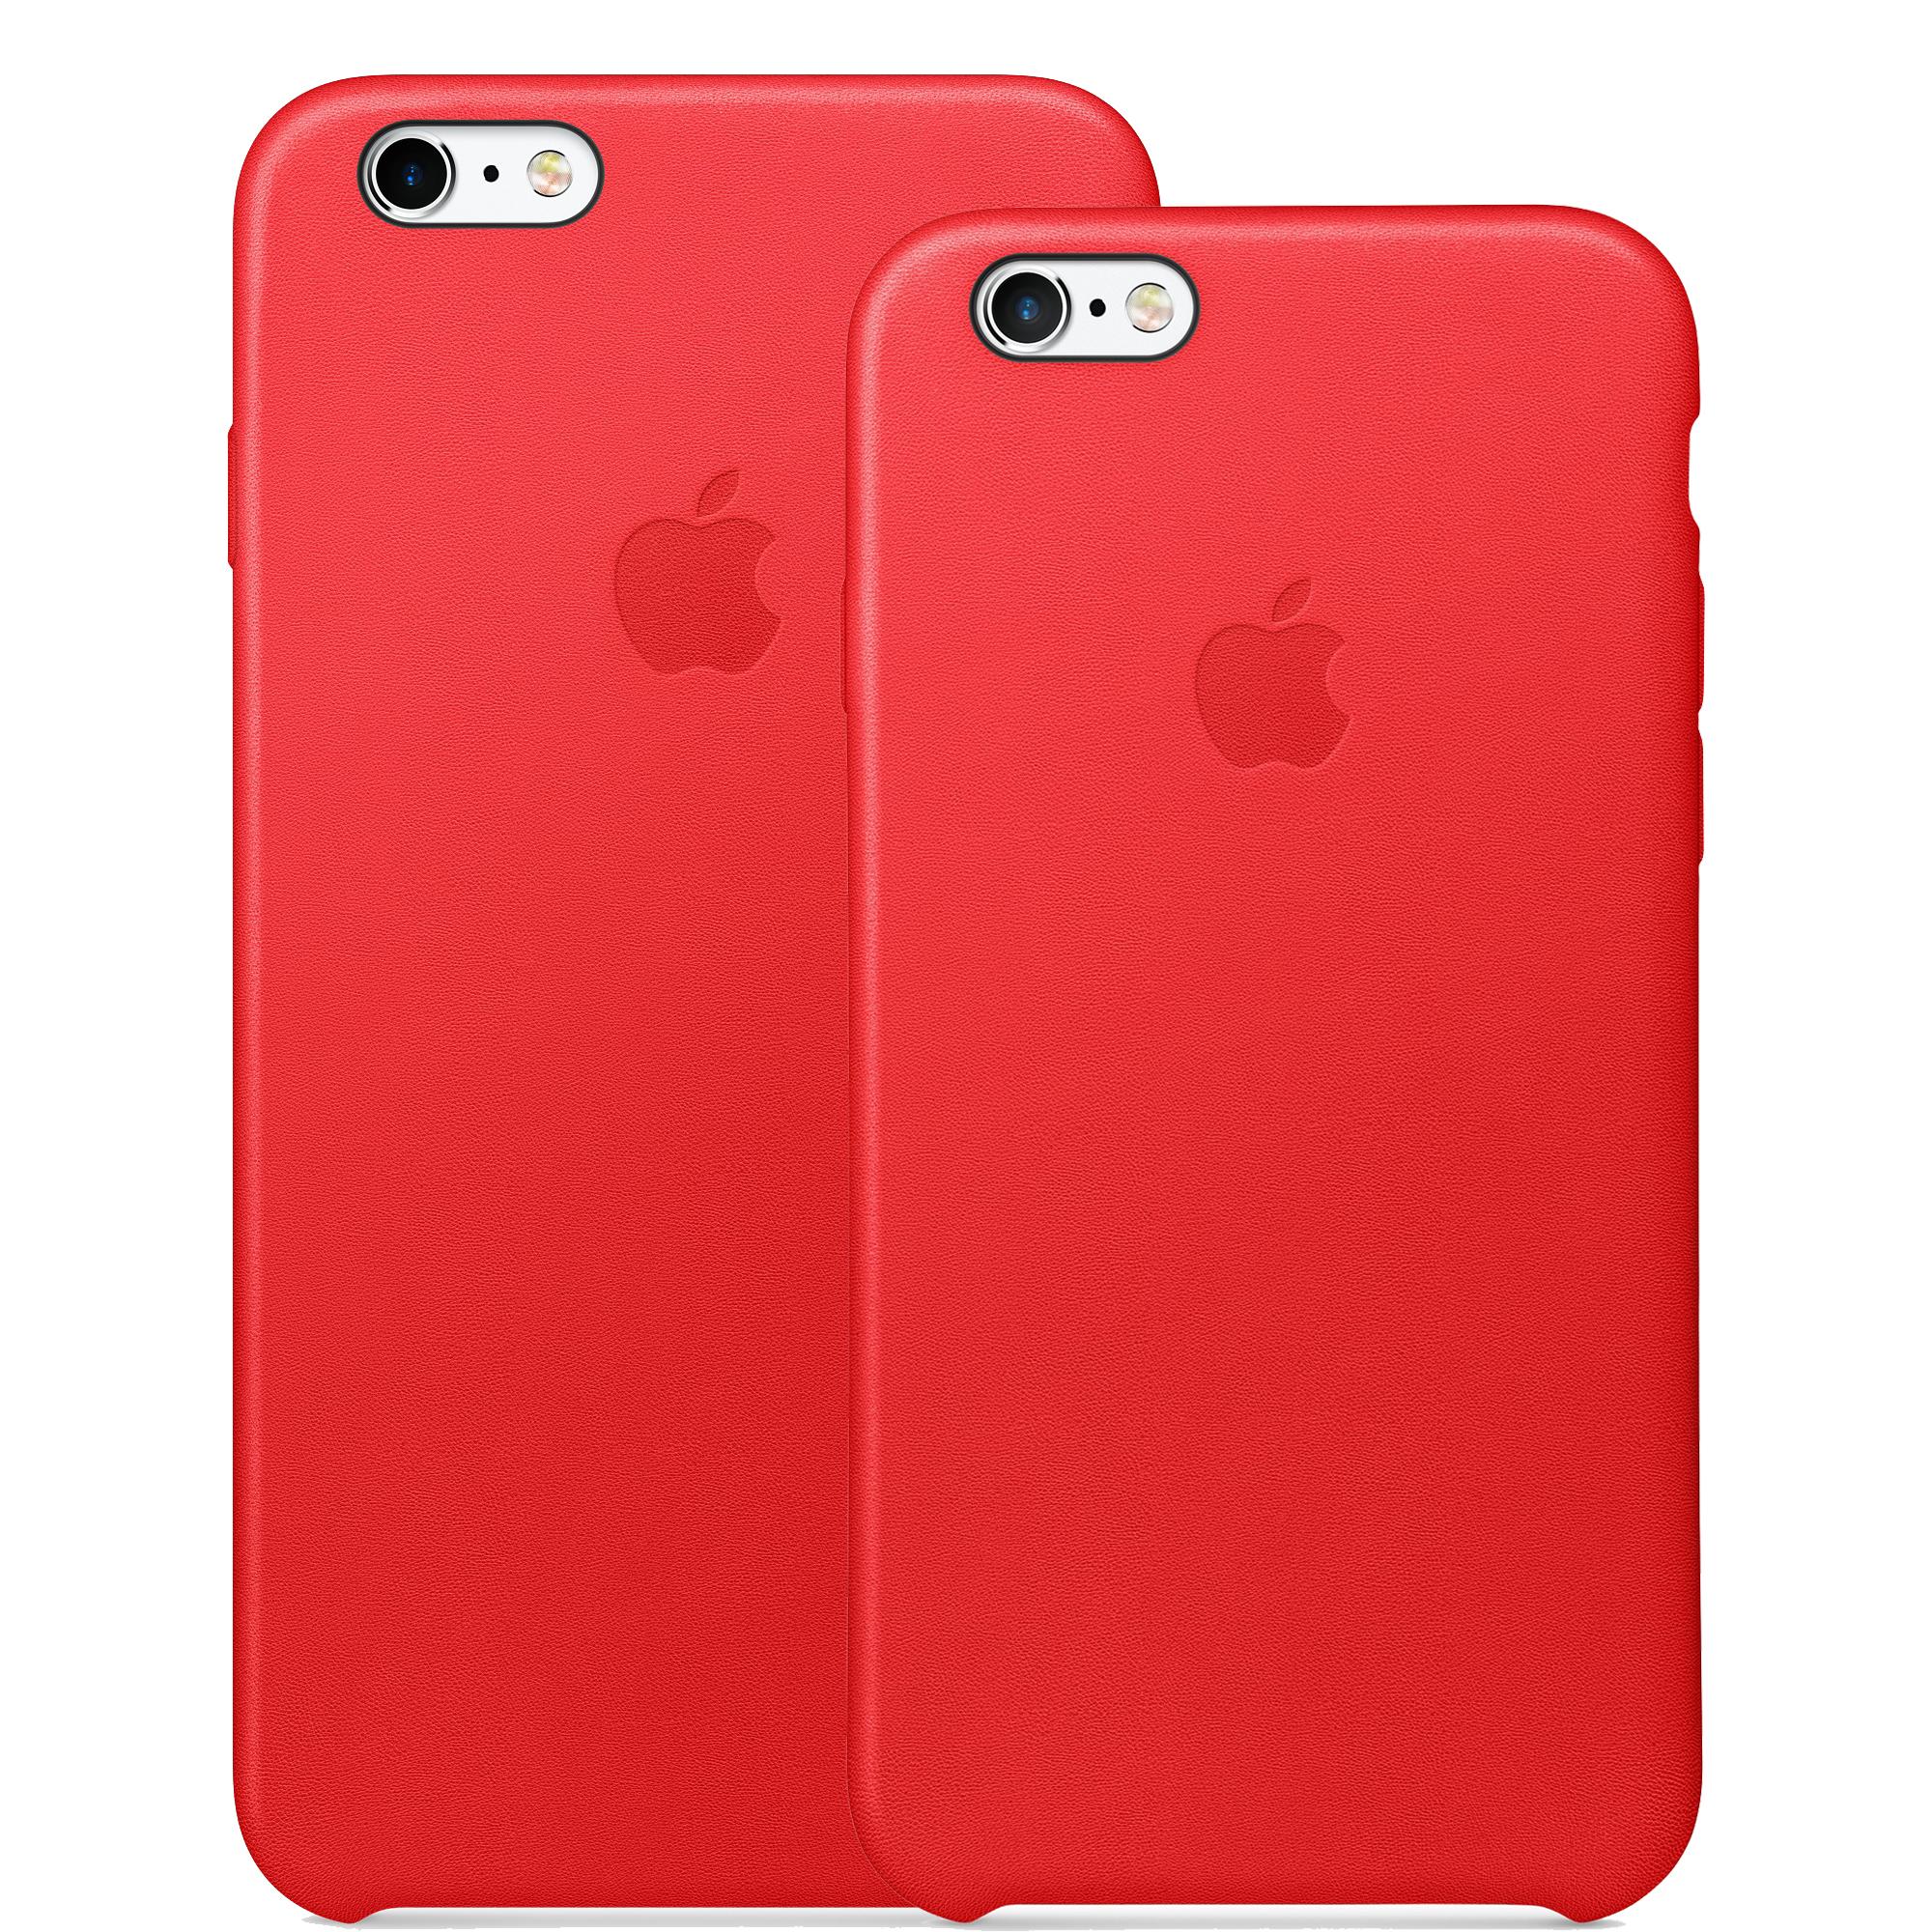 data-applenews-ip_leather_red